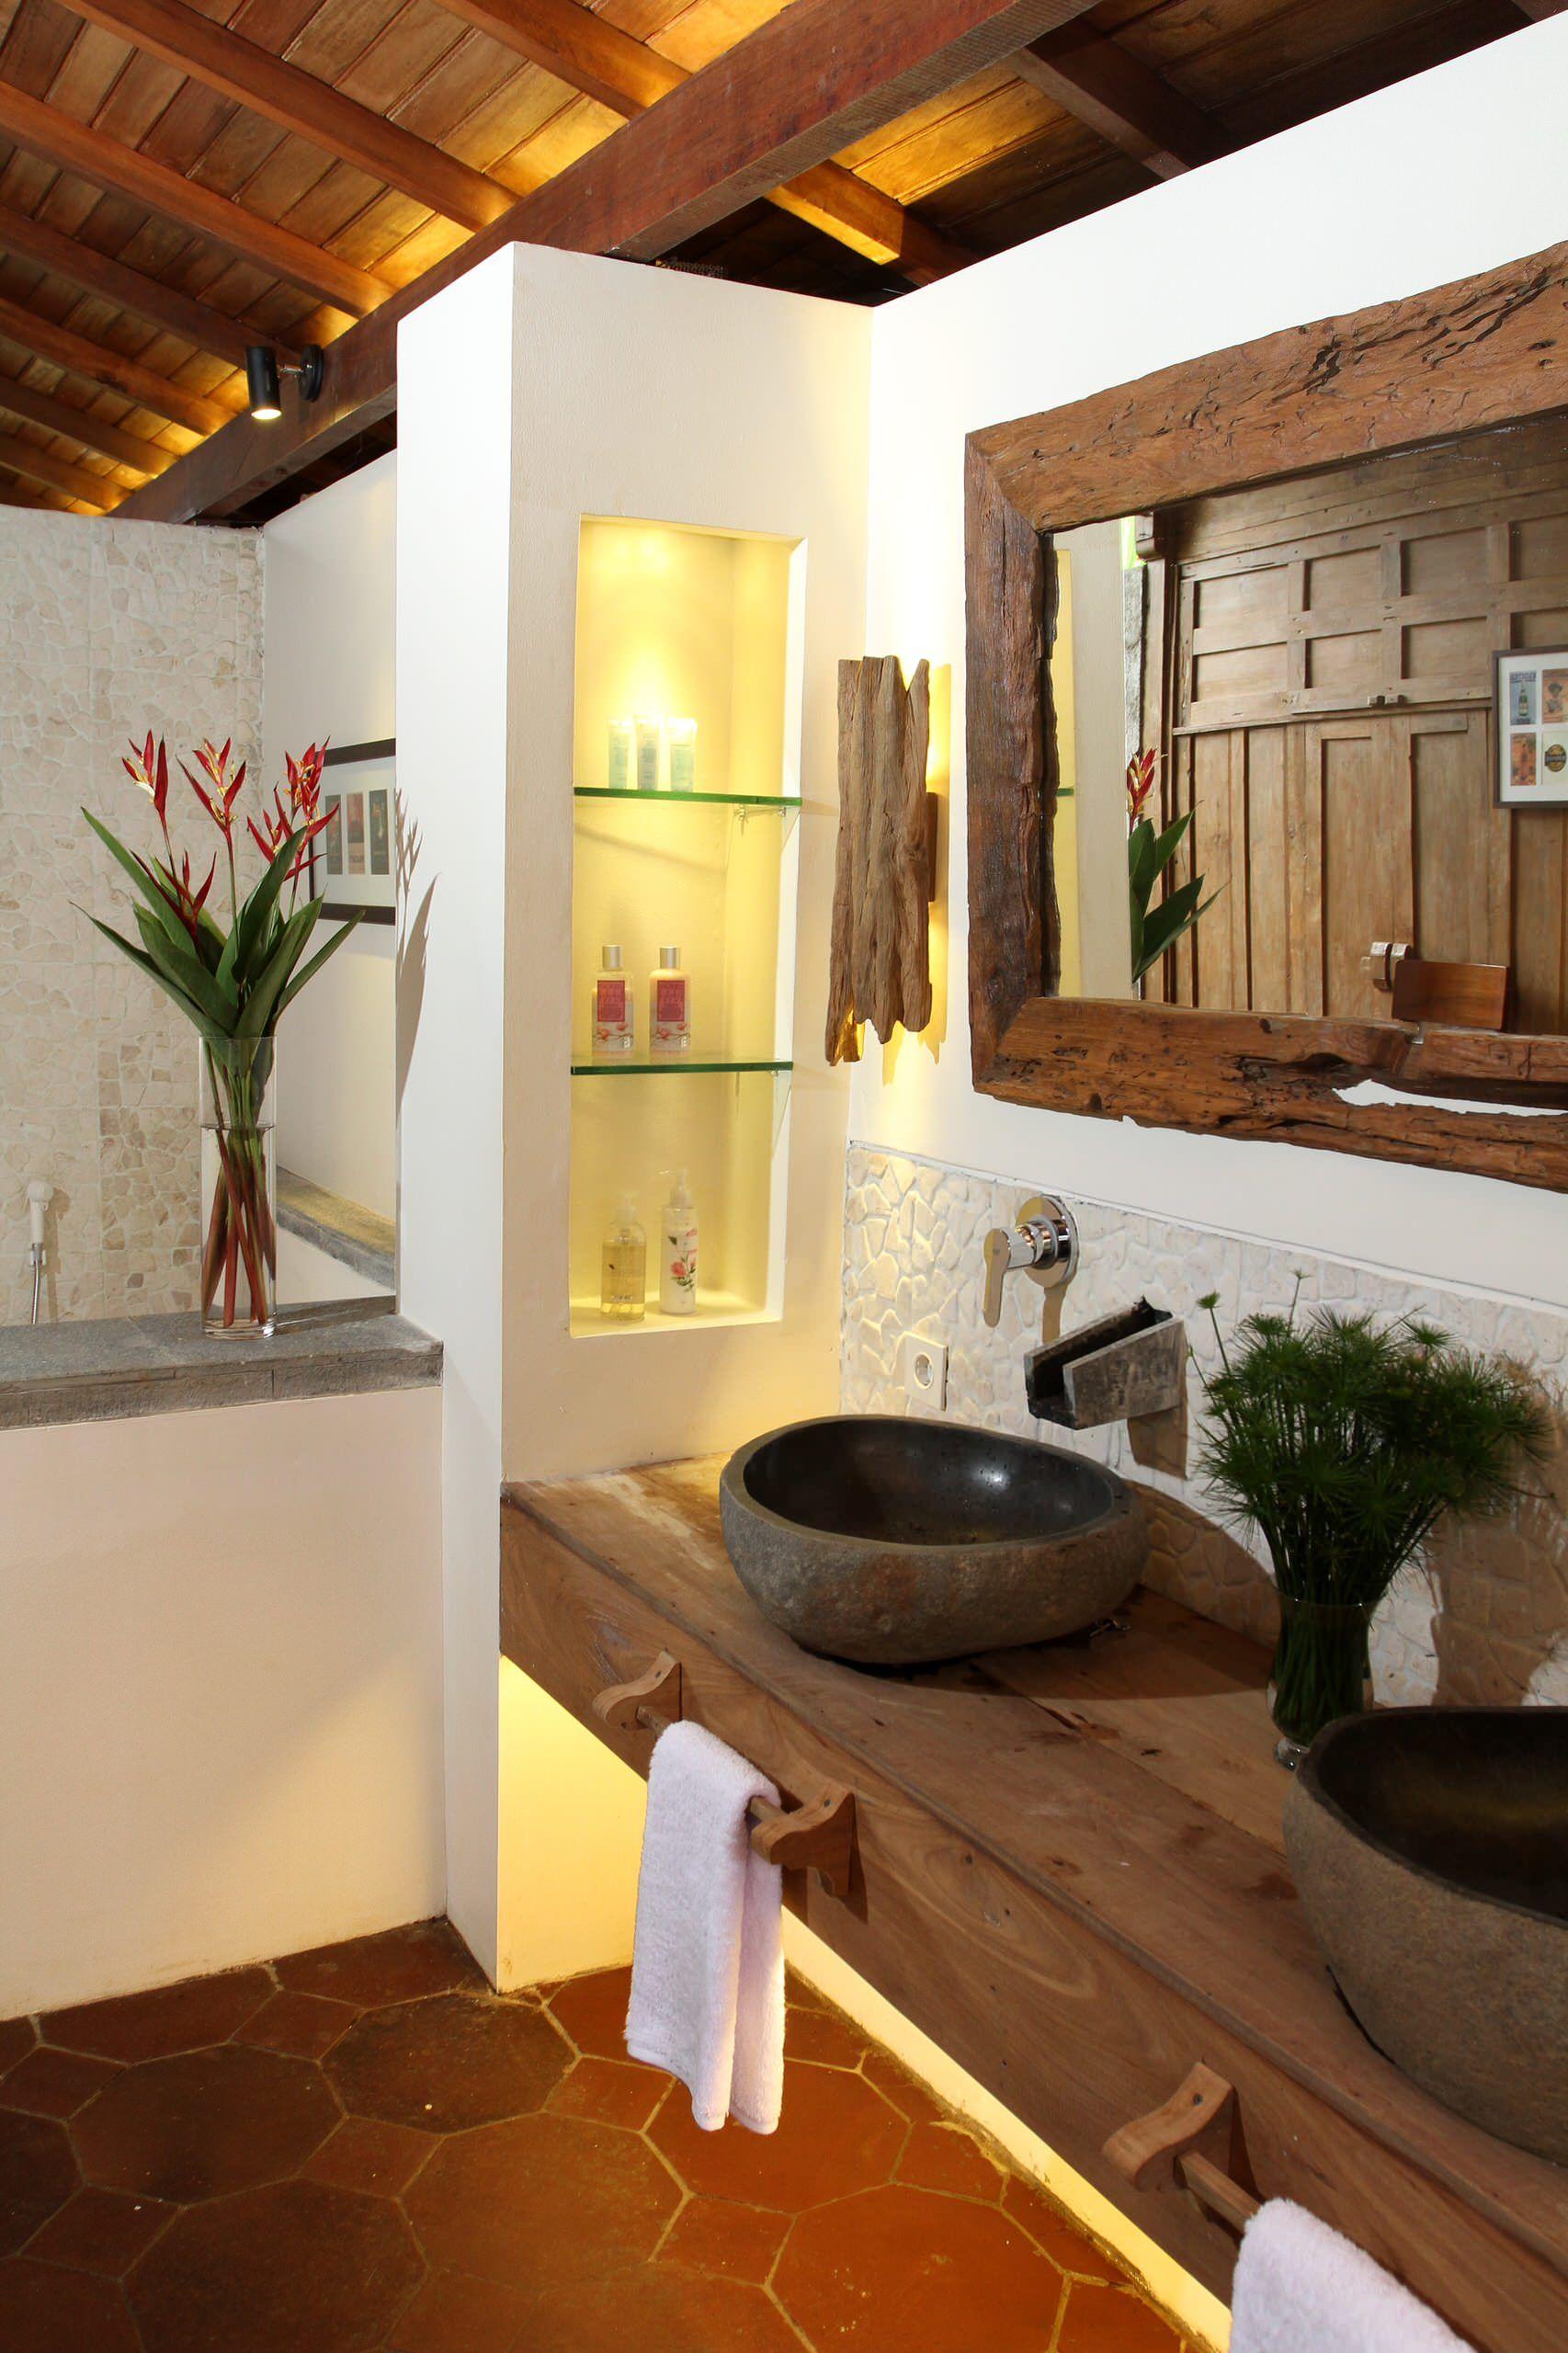 hexagonal-tile-floor-with-rustic-vanity-table-and-vessel-sink ...